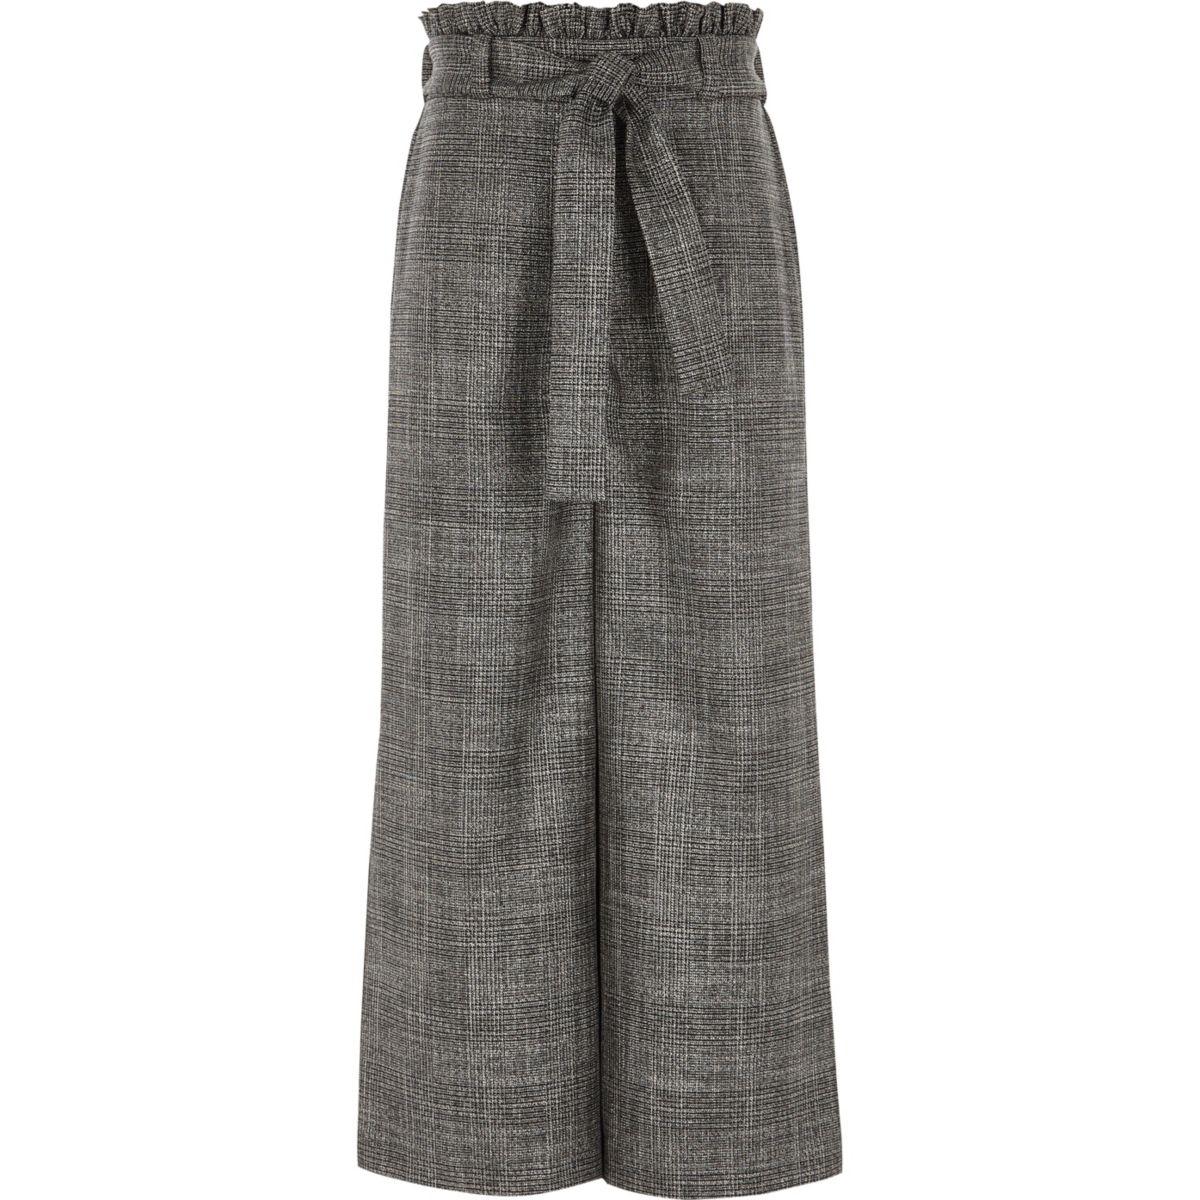 Girls grey check tie waist palazzo pants